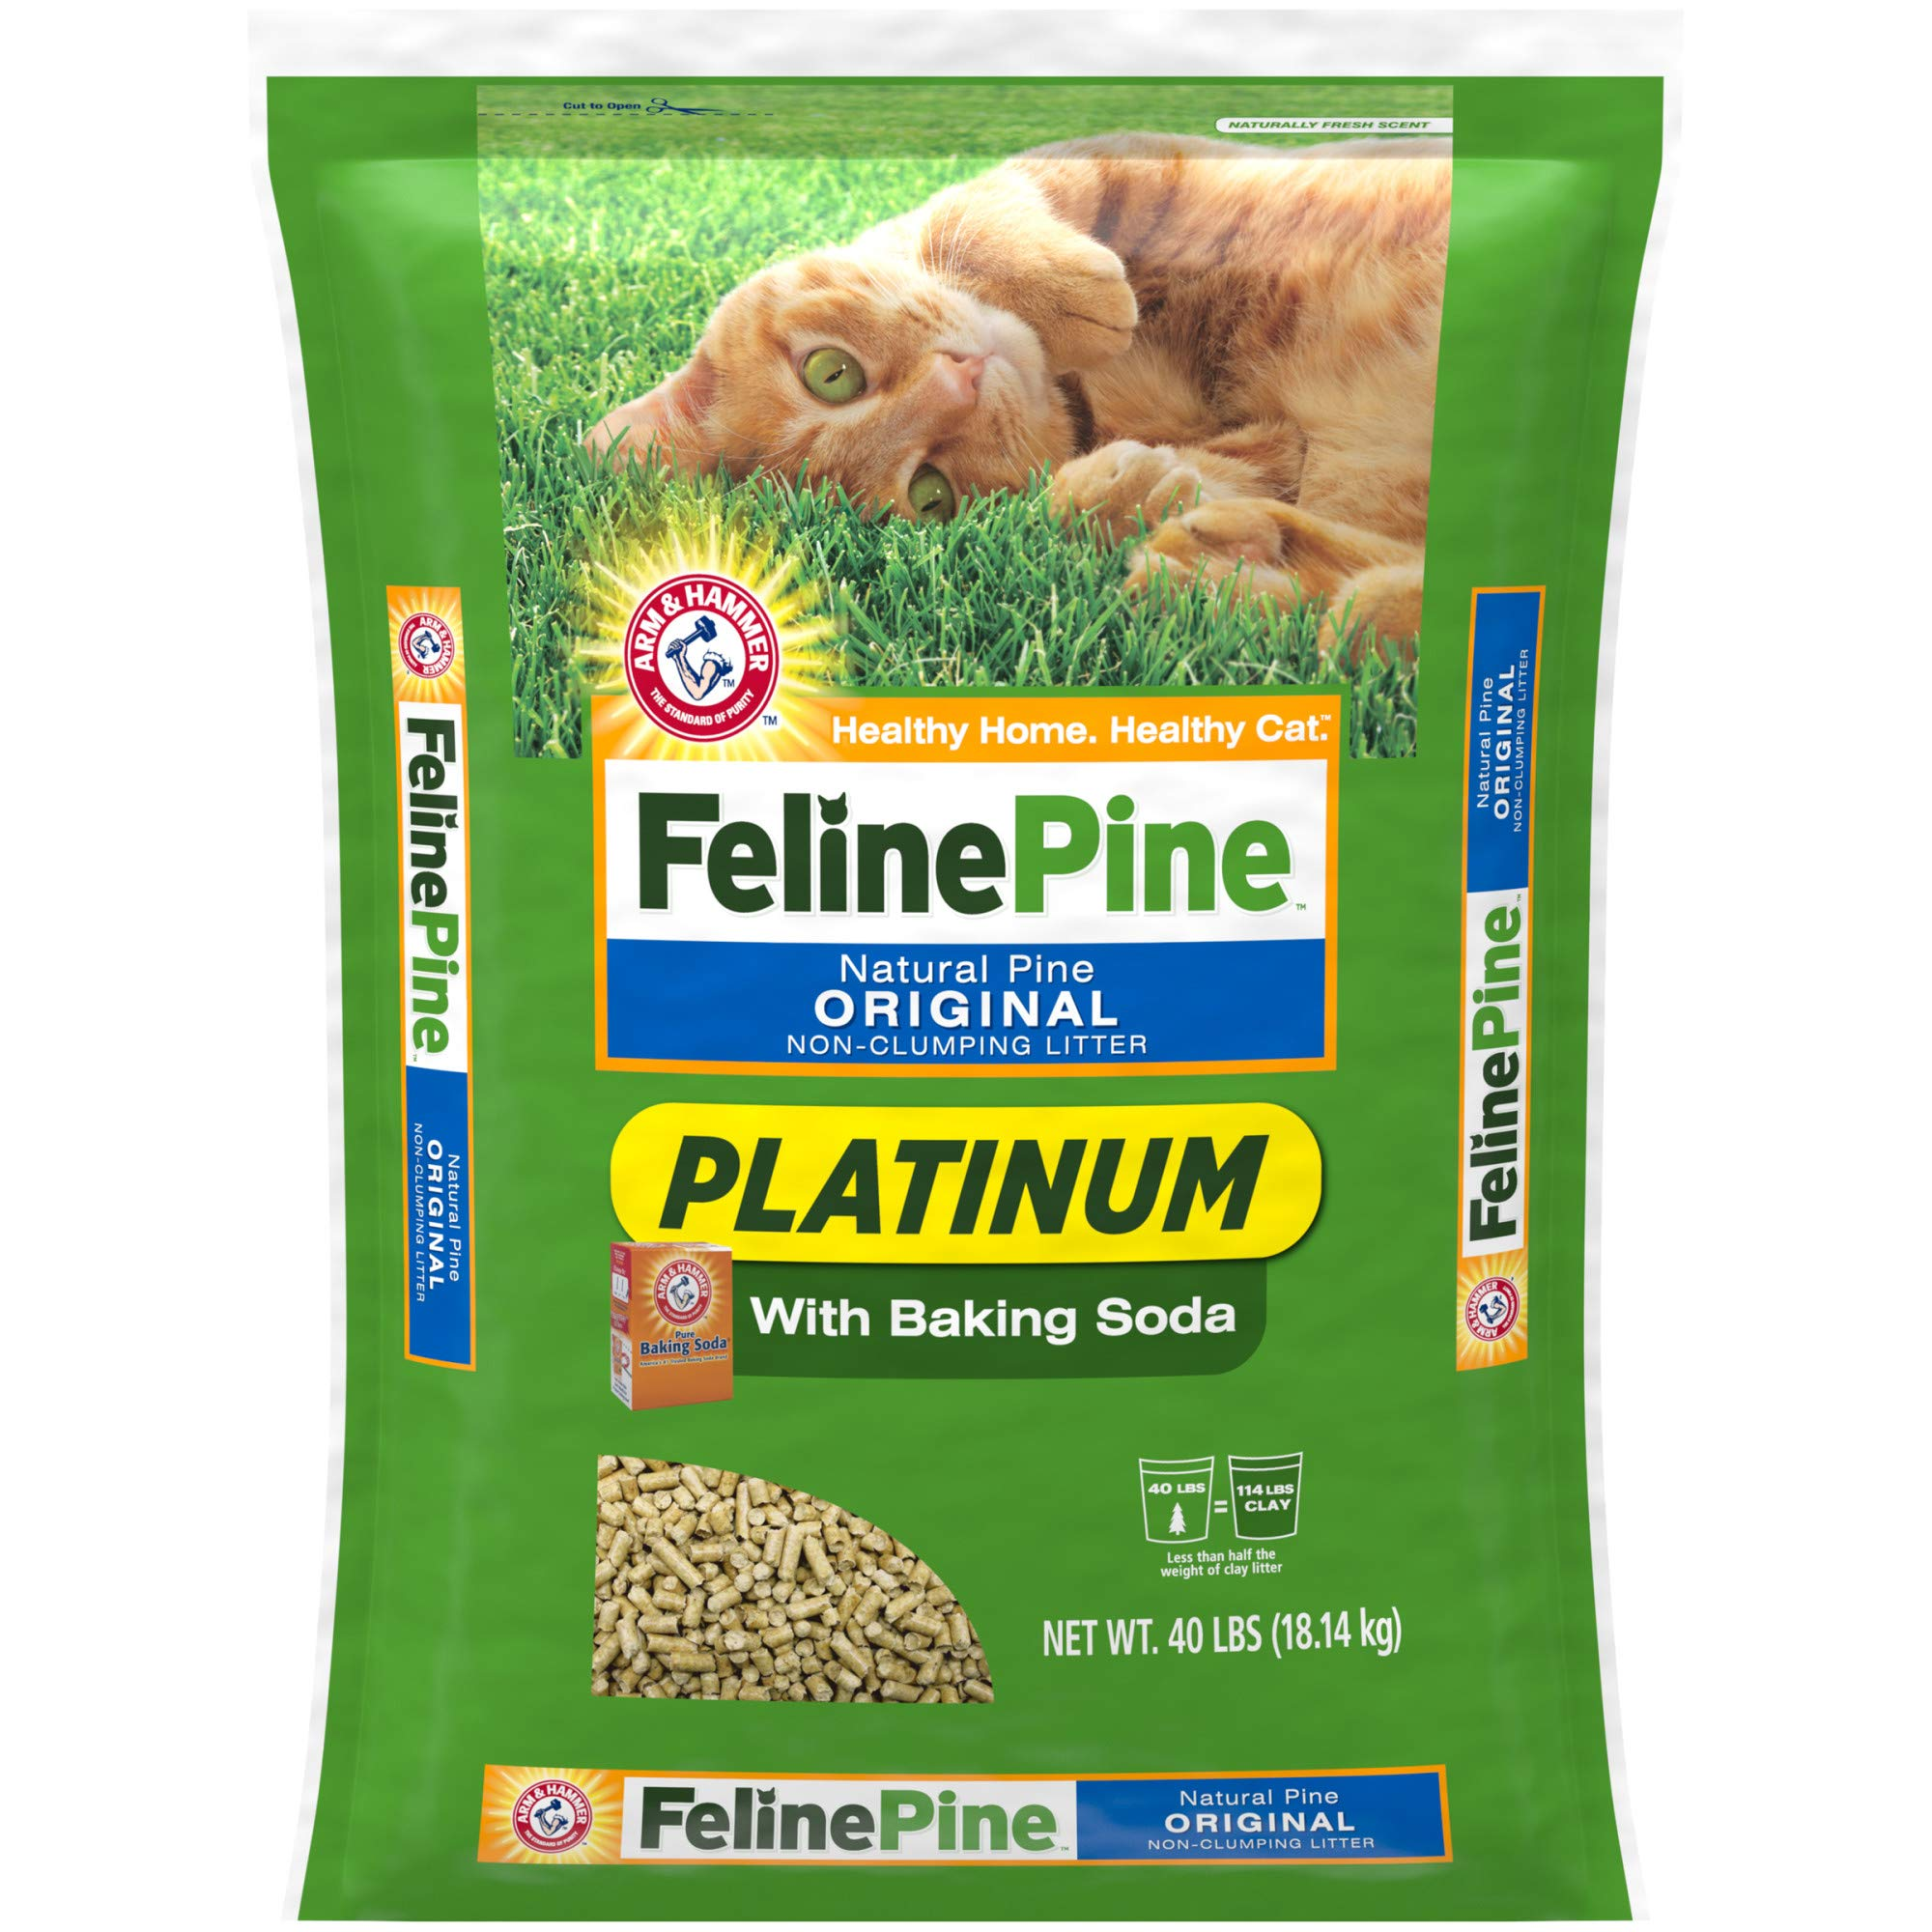 Feline Pine Platinum Natural Pine Original Non-Clumping Cat Litter, with Baking Soda, 40 lb by Feline Pine